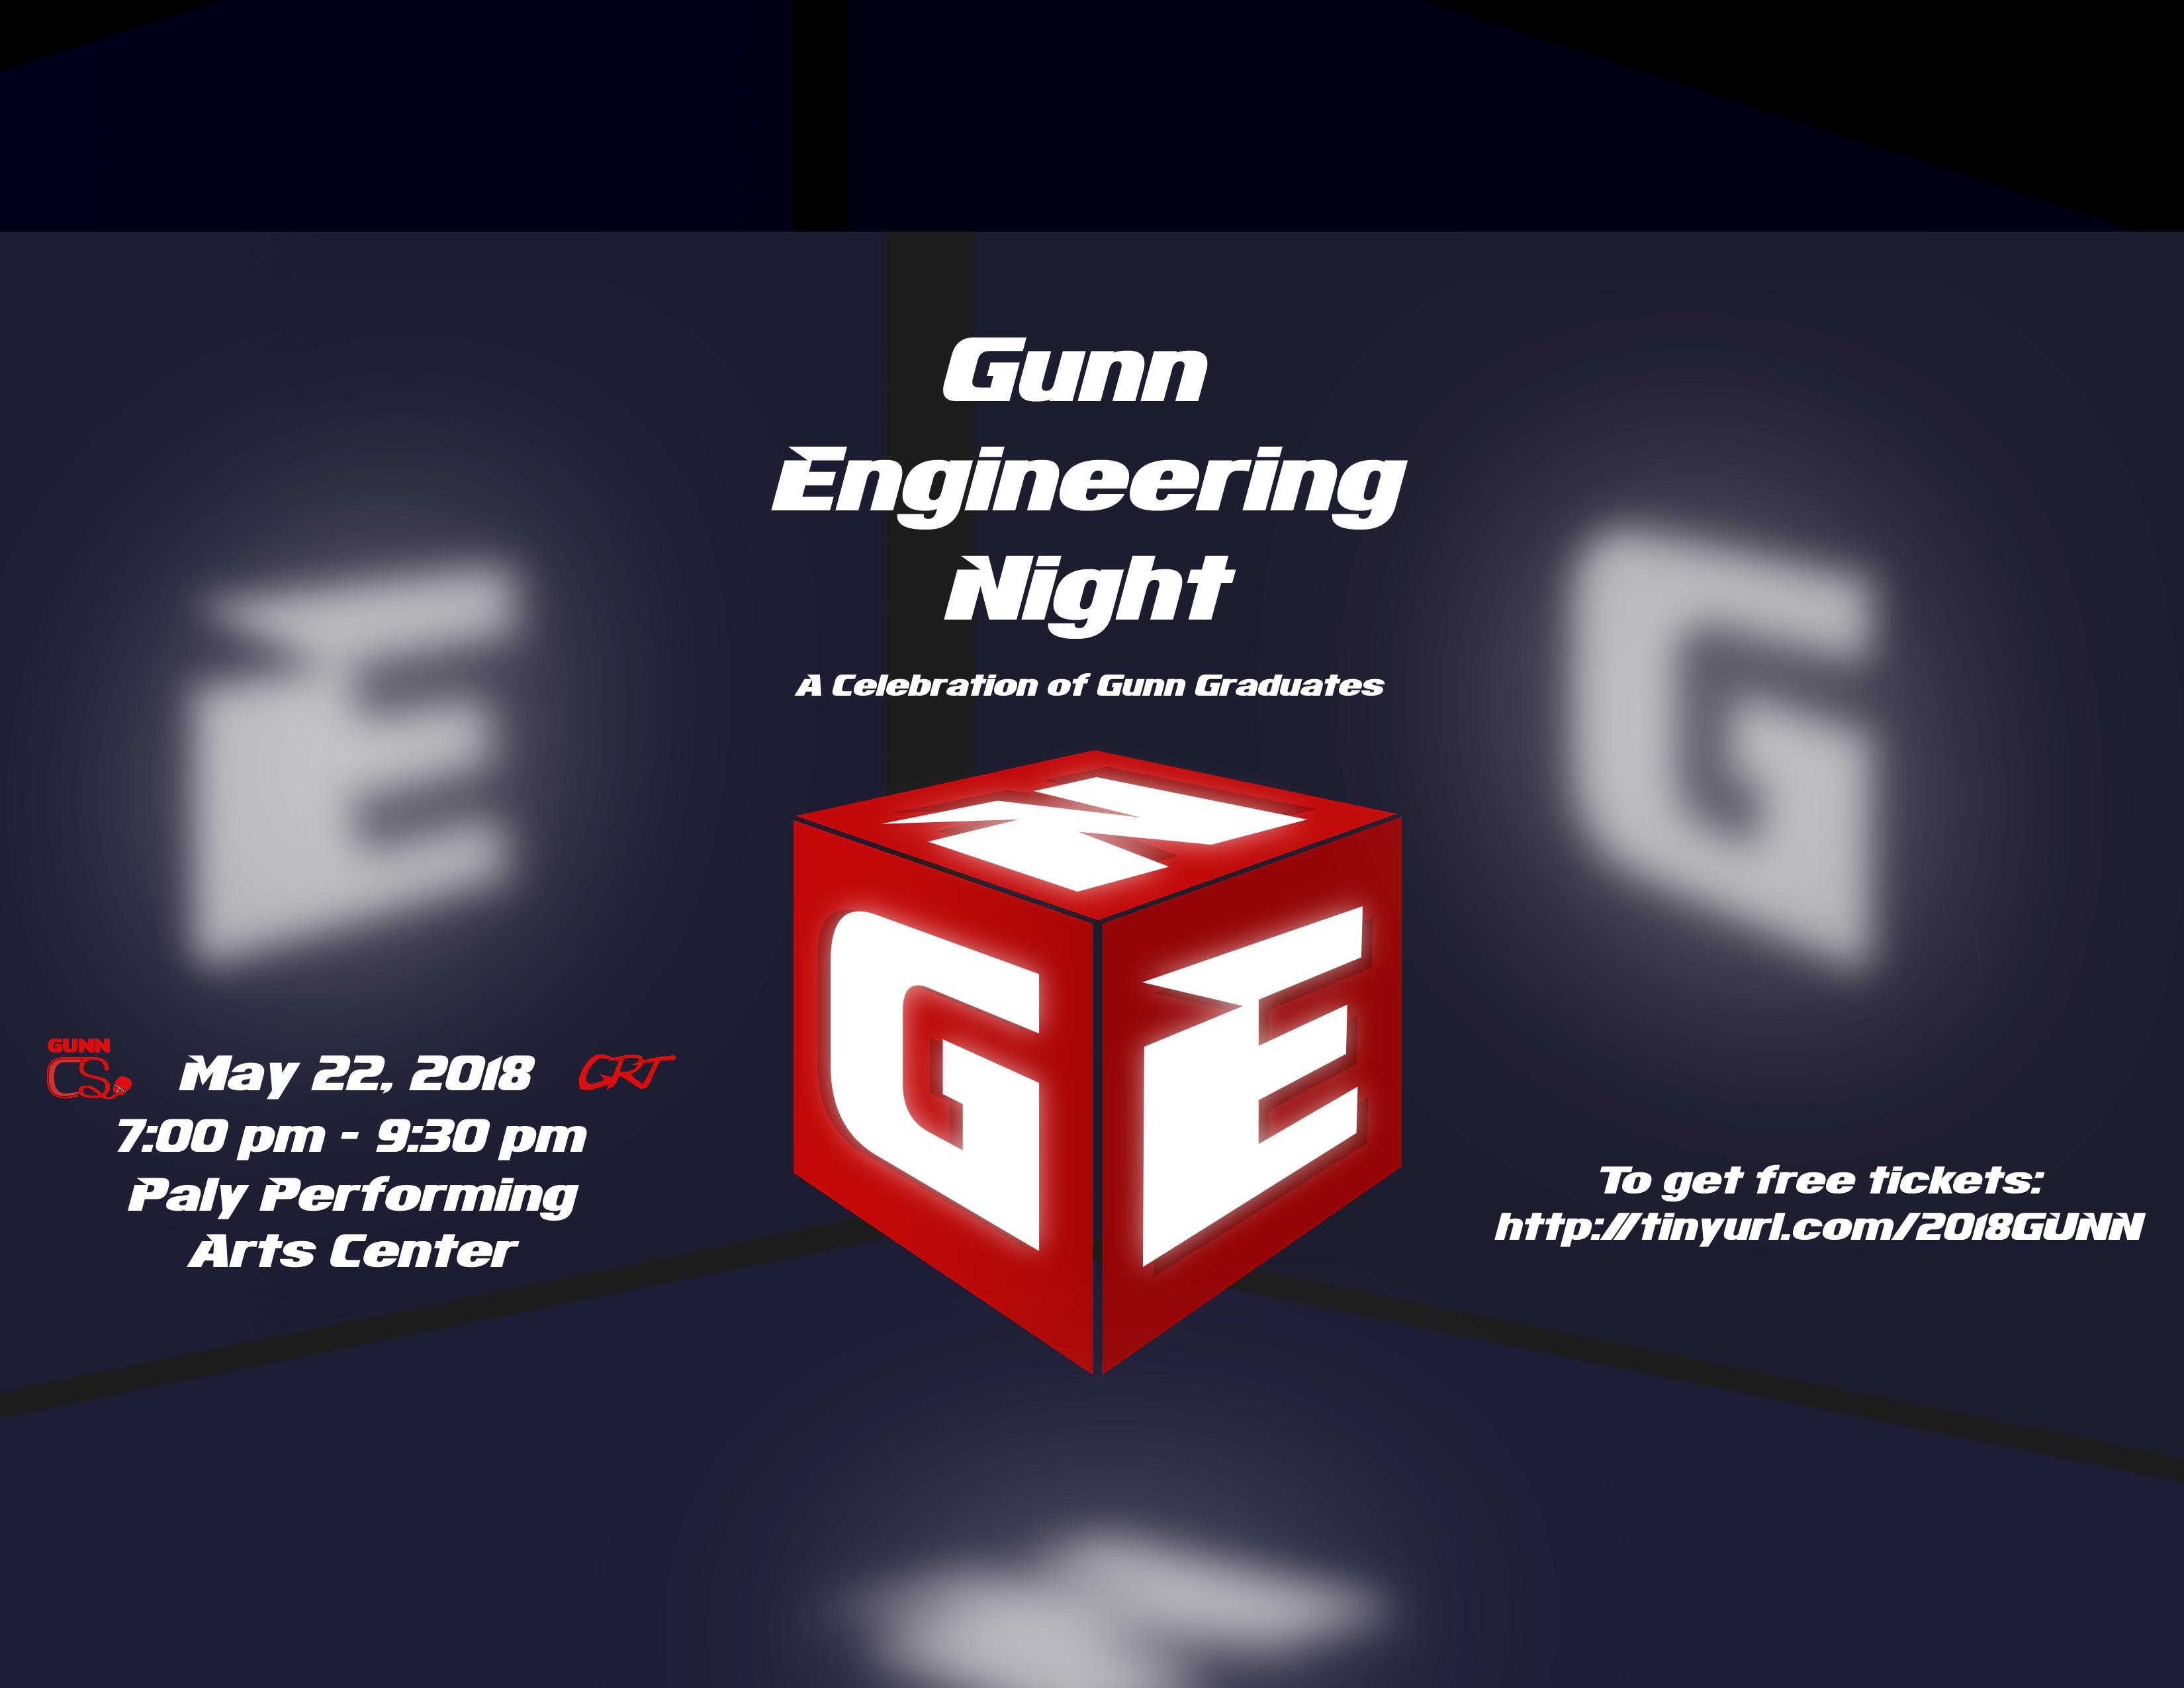 Gunn Engineering Night 2018